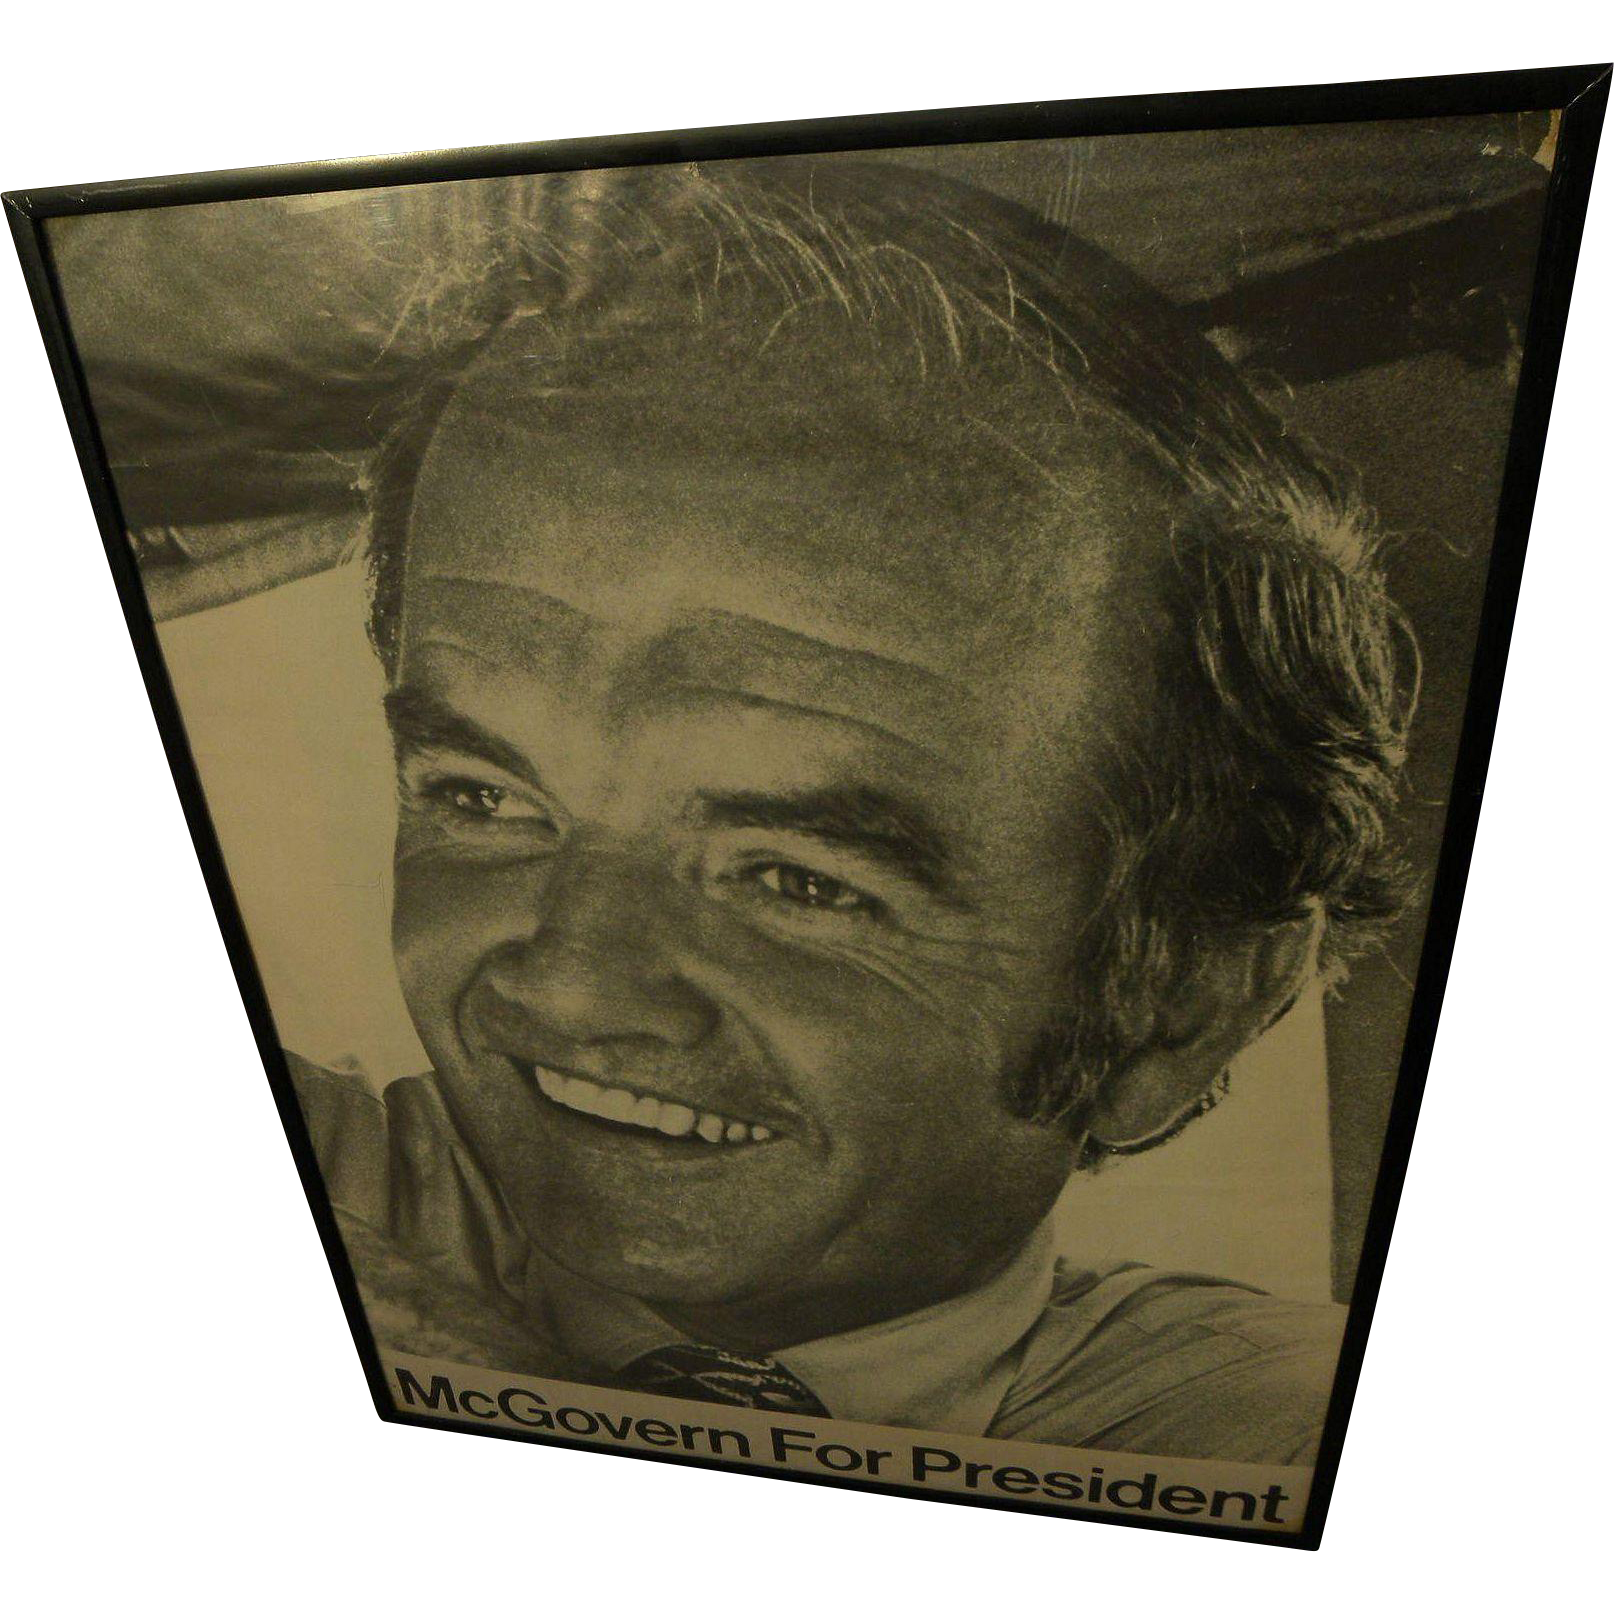 George McGovern for President 1972 poster vintage political memorabilia